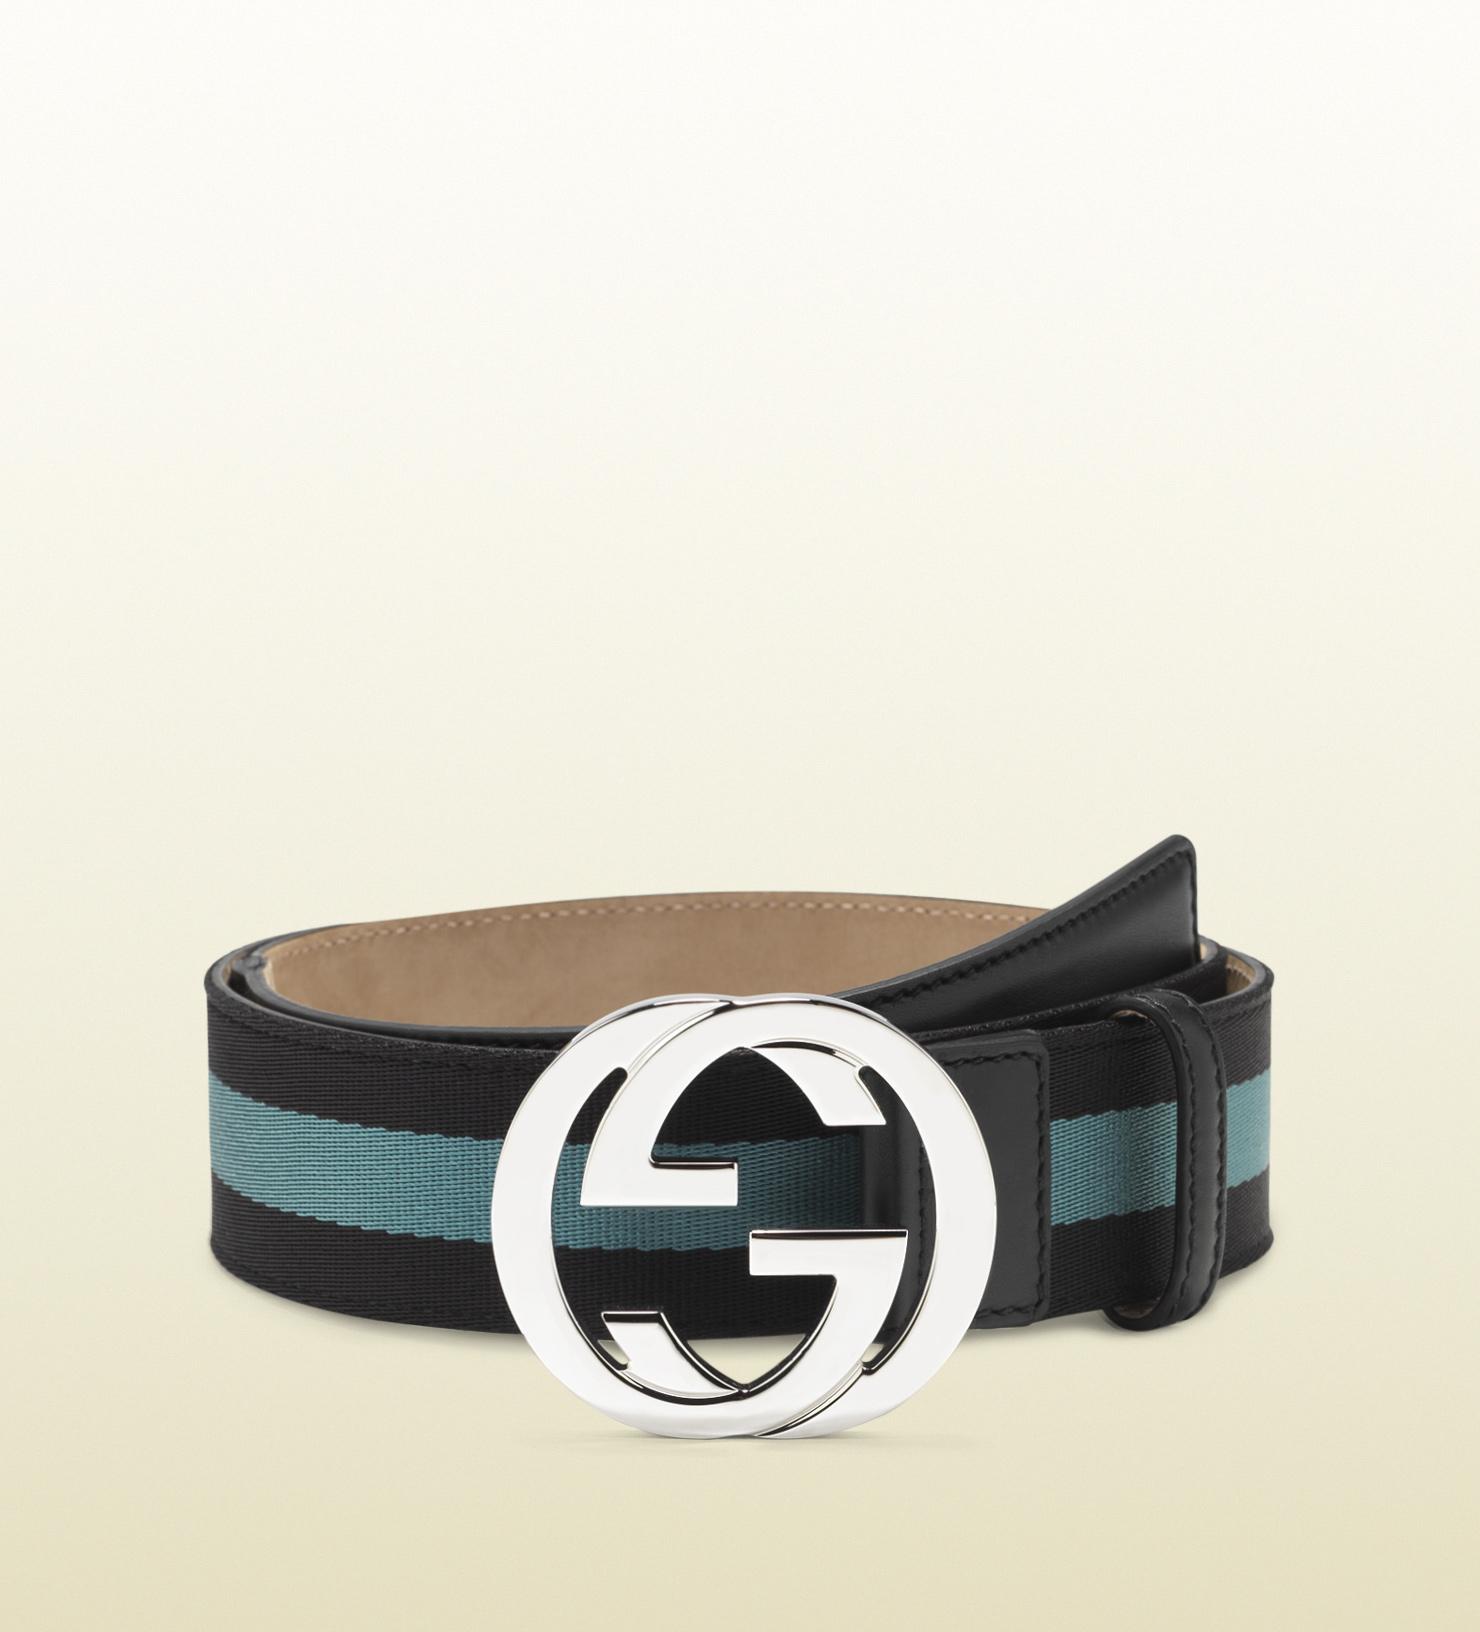 25d1add68ba6 Gucci Nylon Web Belt with Interlocking G Buckle in Blue for Men - Lyst